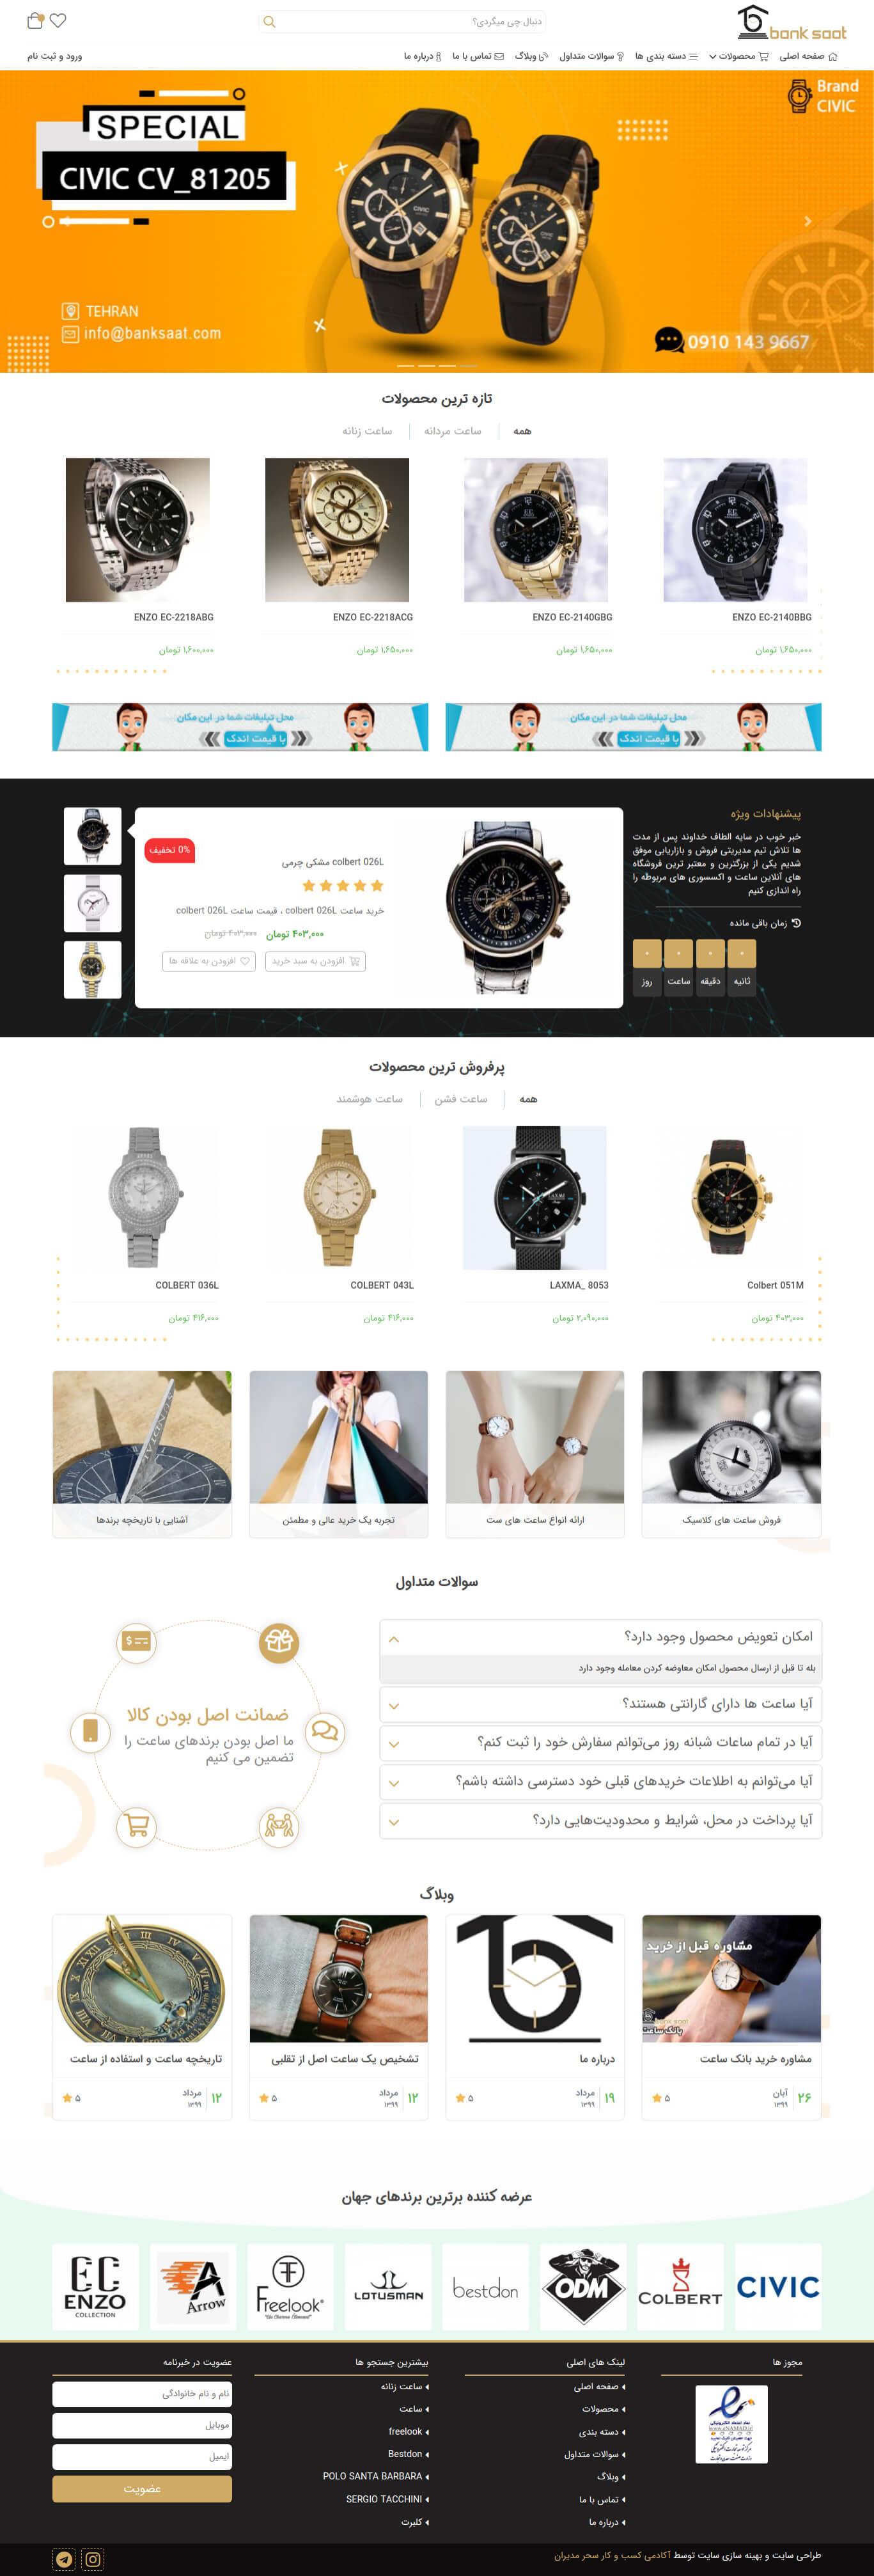 banksaat.com-home.jpg